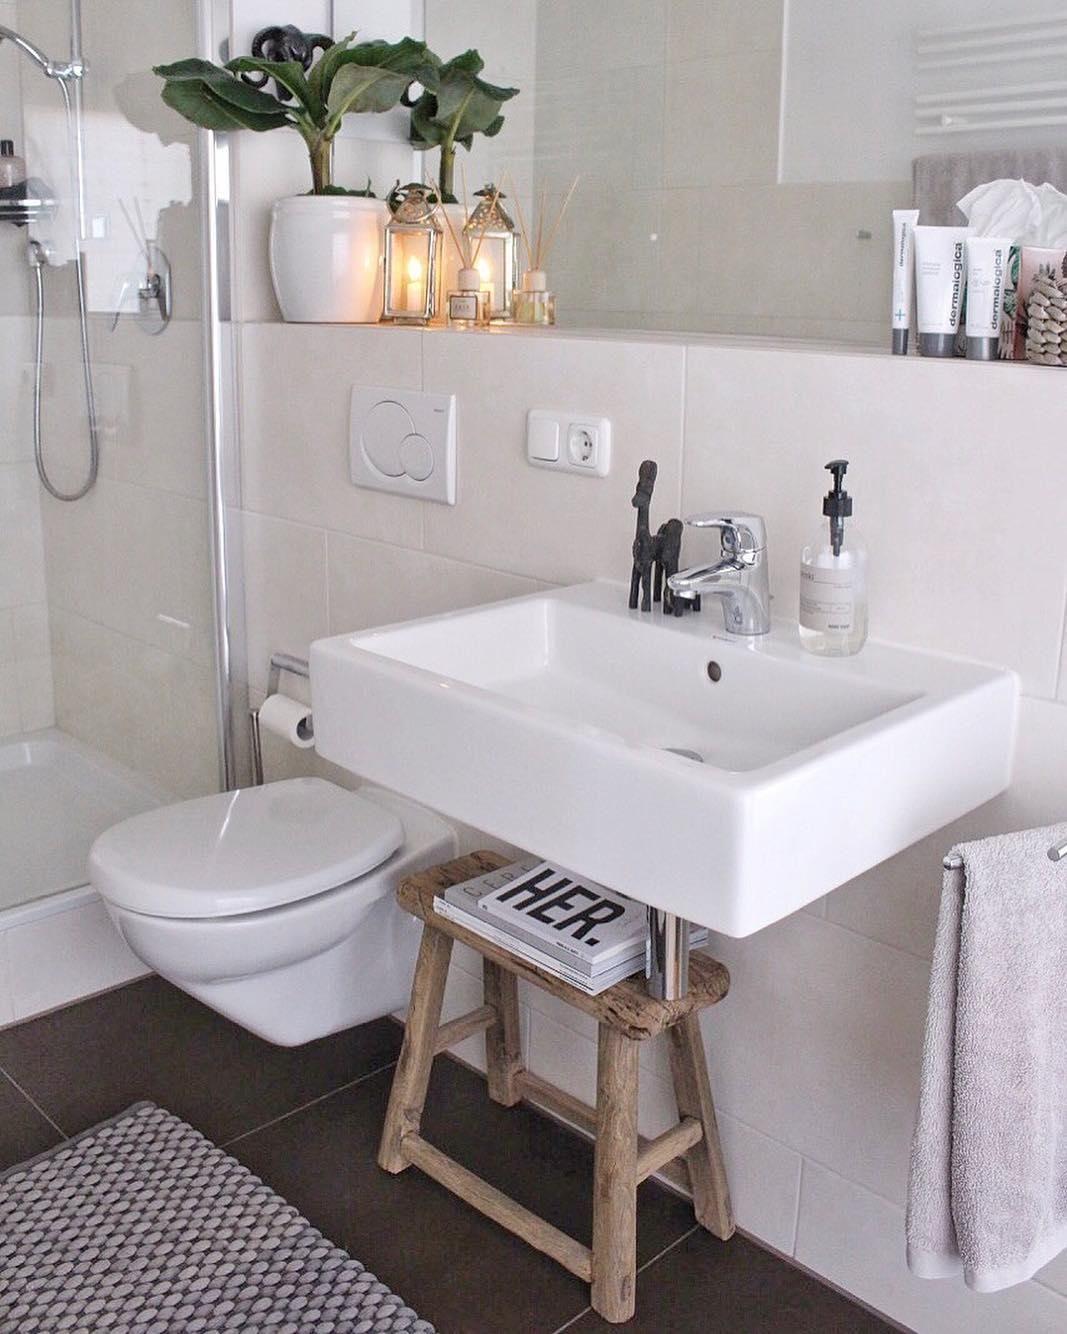 Hocker Lawas  kylppri  Badezimmer holz Wohnung